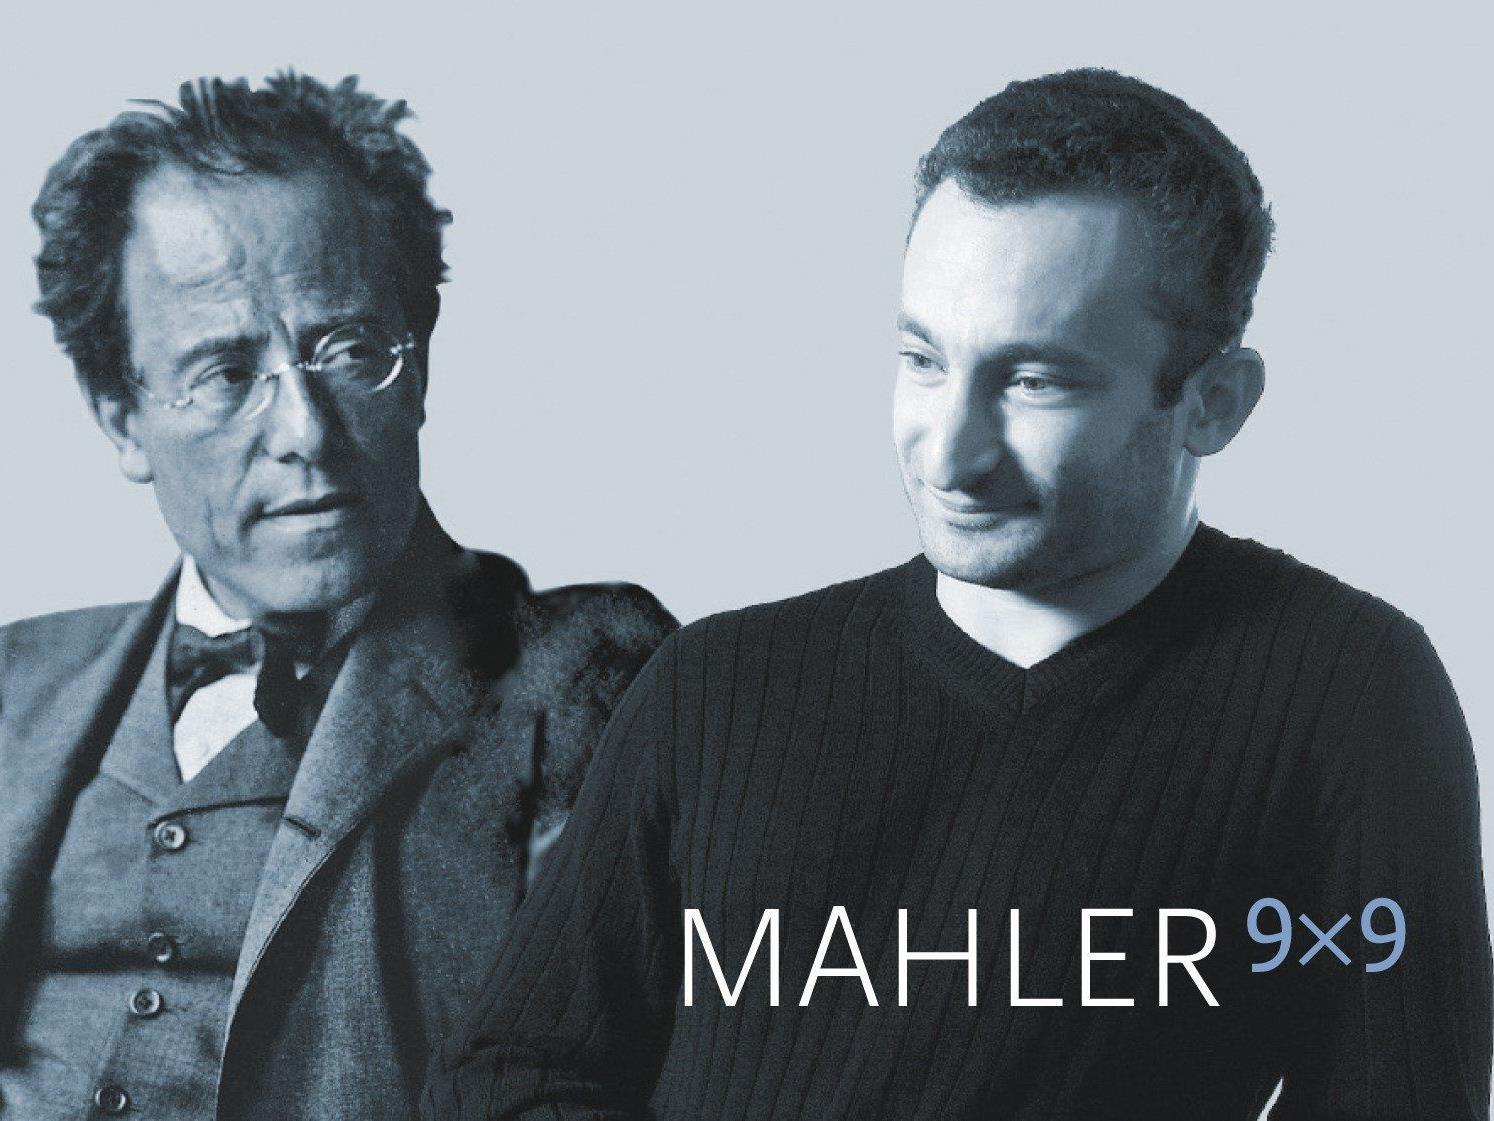 Kirill Petrenko dirigiert den Erfolgszyklus MAHLER 9x9 des Symphonieorchesters Vorarlberg.